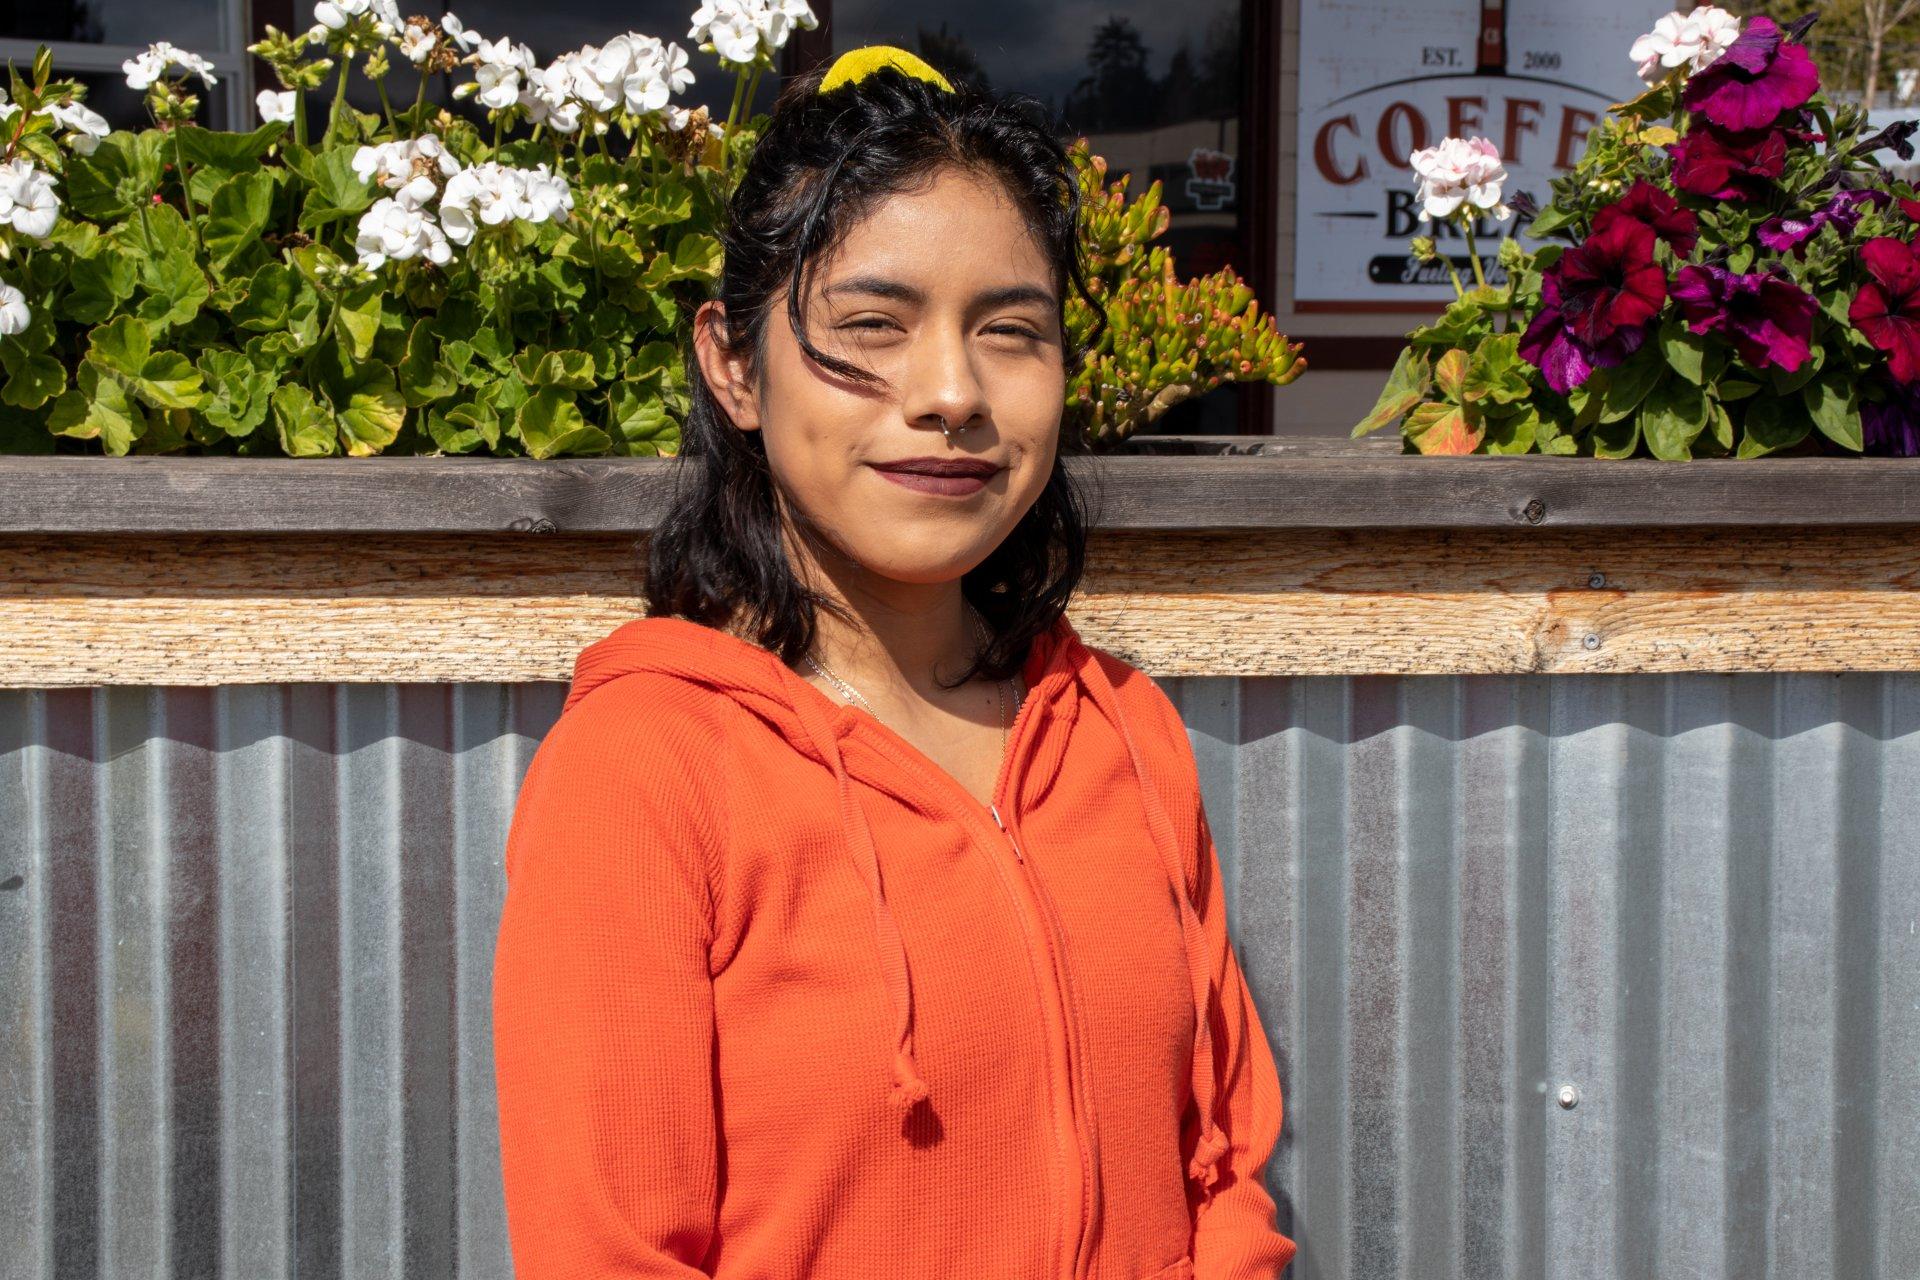 Associated Students President Lizbeth Cano-Sanchez at Coffee Break in Bayside, California on March 18.   Photo by Dakota Cox